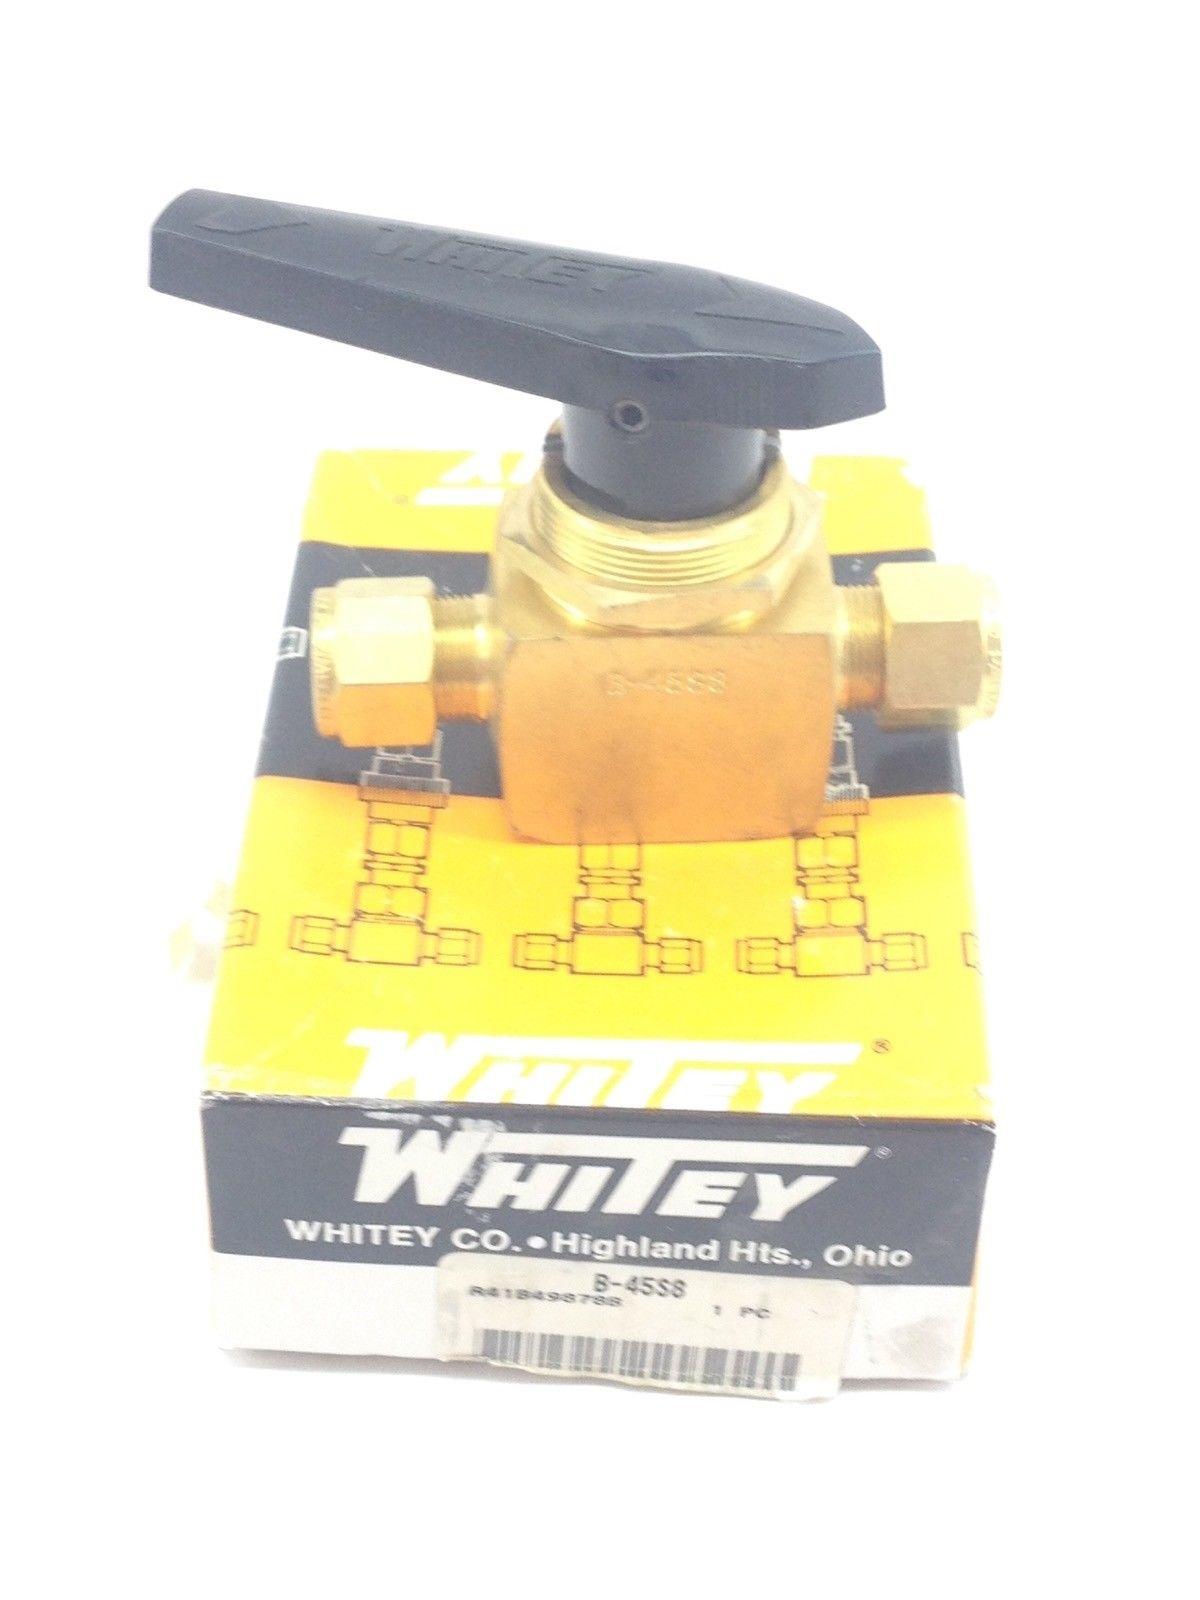 WHITEY B-45S8 THREADED BALL VALVE BRASS (H340) 1